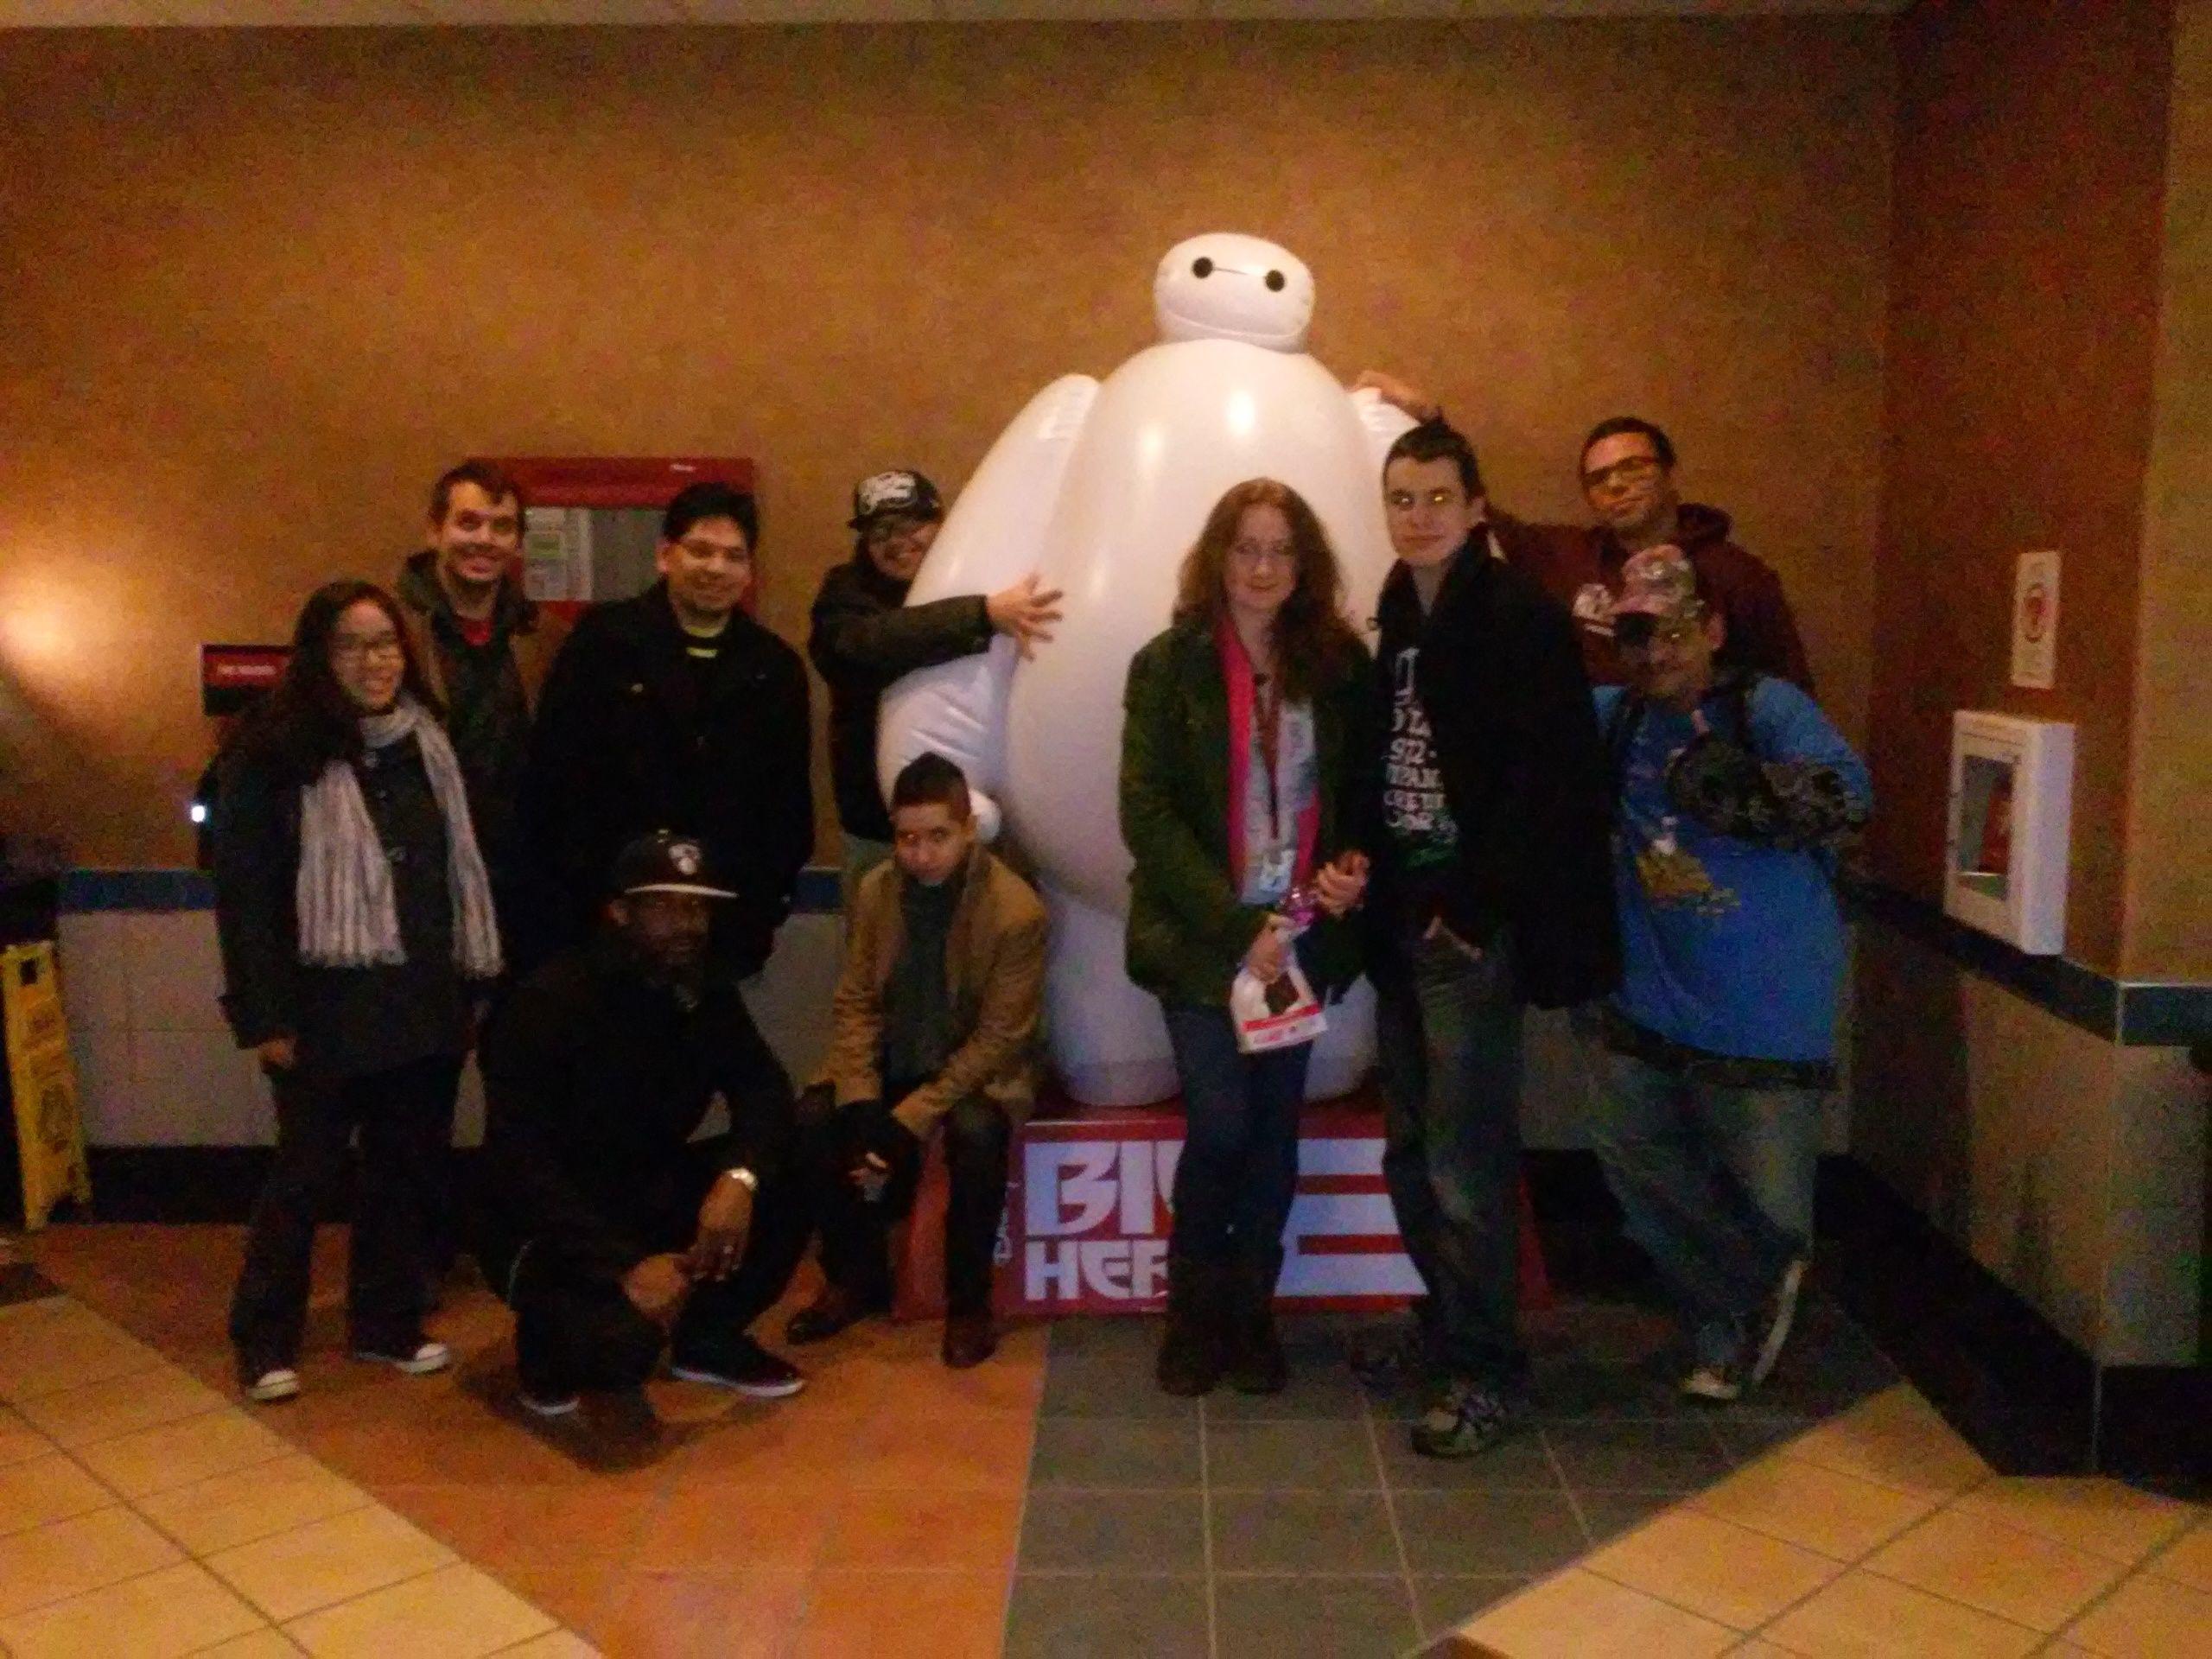 New York City Geek Adventure Group